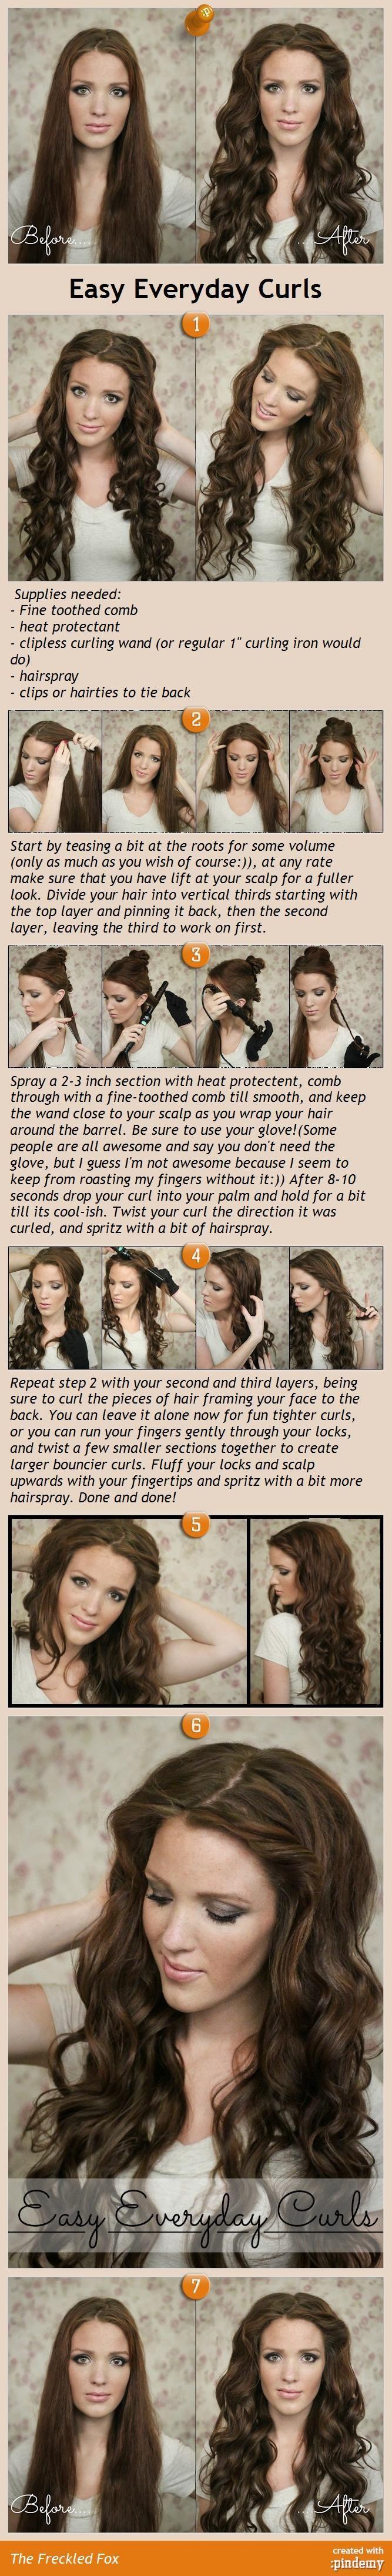 Craftionary easy everyday curls hair tutorial solutioingenieria Images